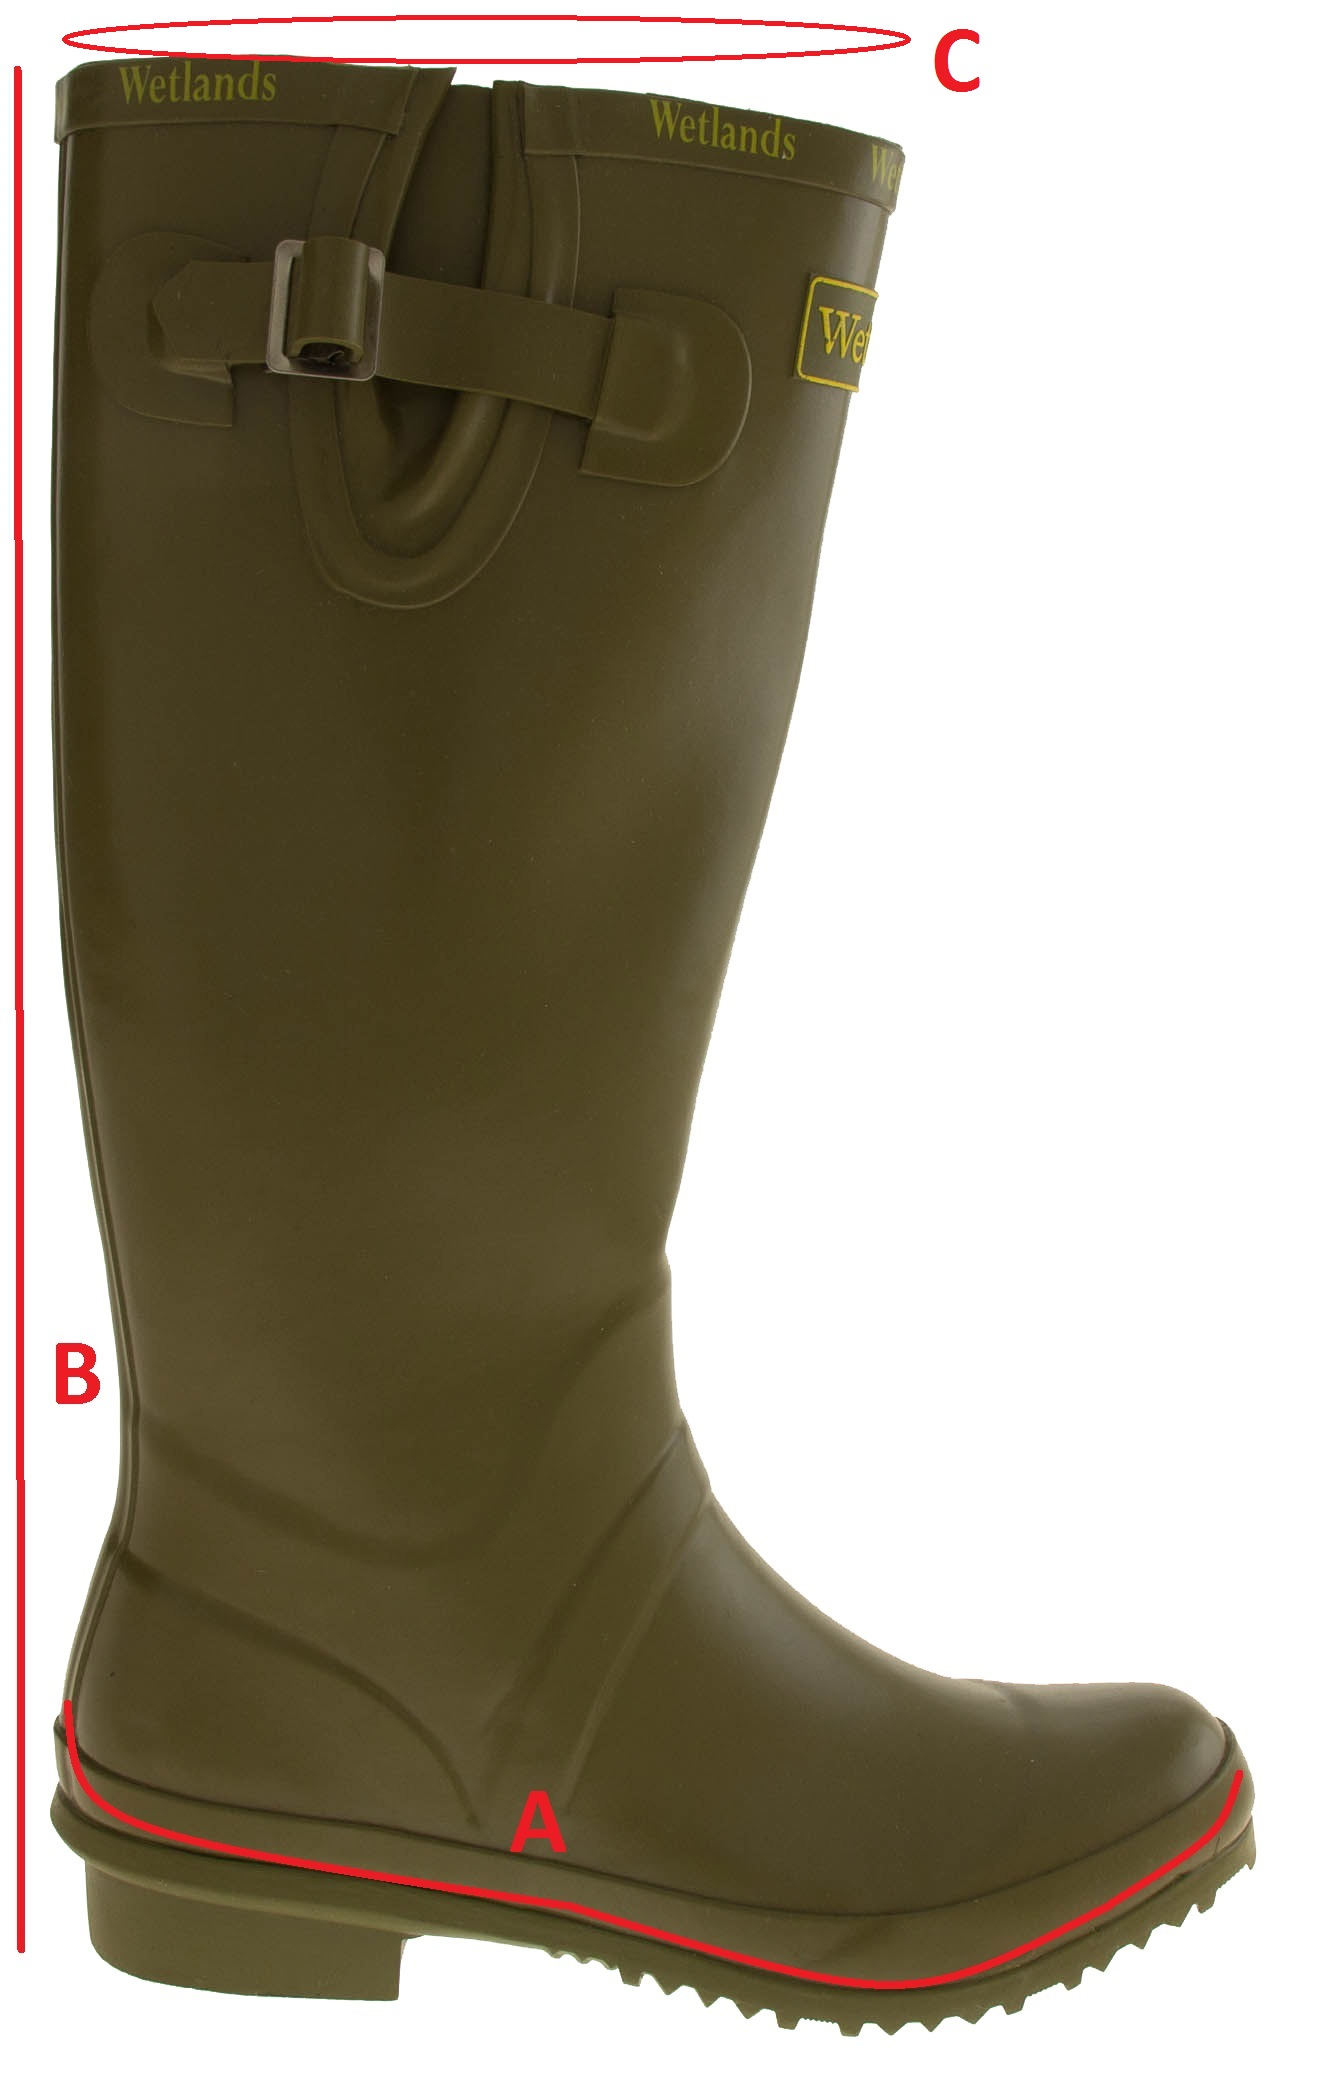 Excellent Aigle Ladies Landfast Brown Short Gardening Ankle Boots Walking Wellies | EBay